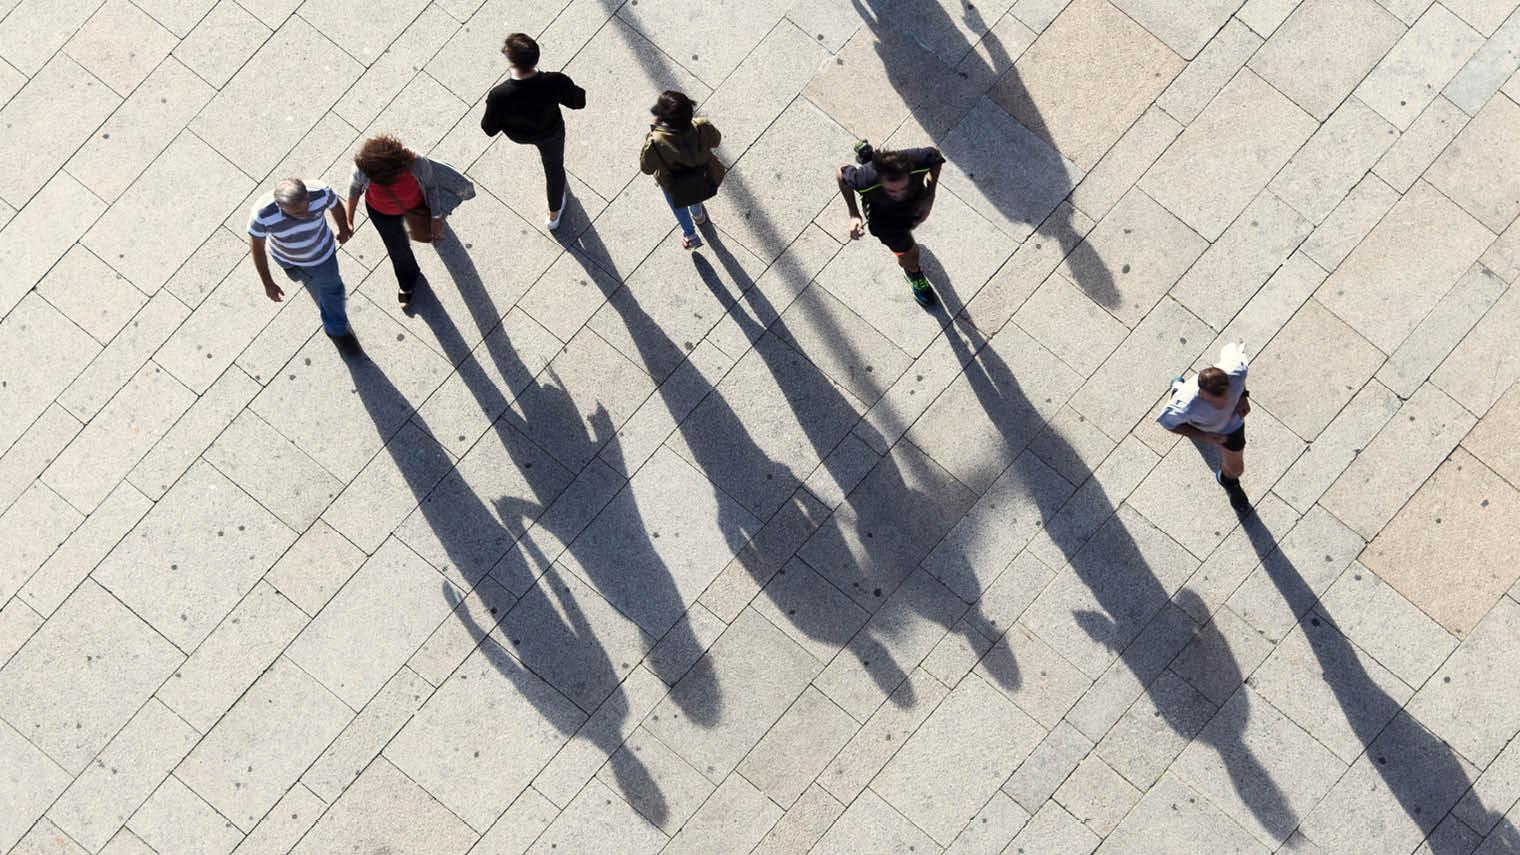 CIO versus CEO: who really drives enterprise agility?